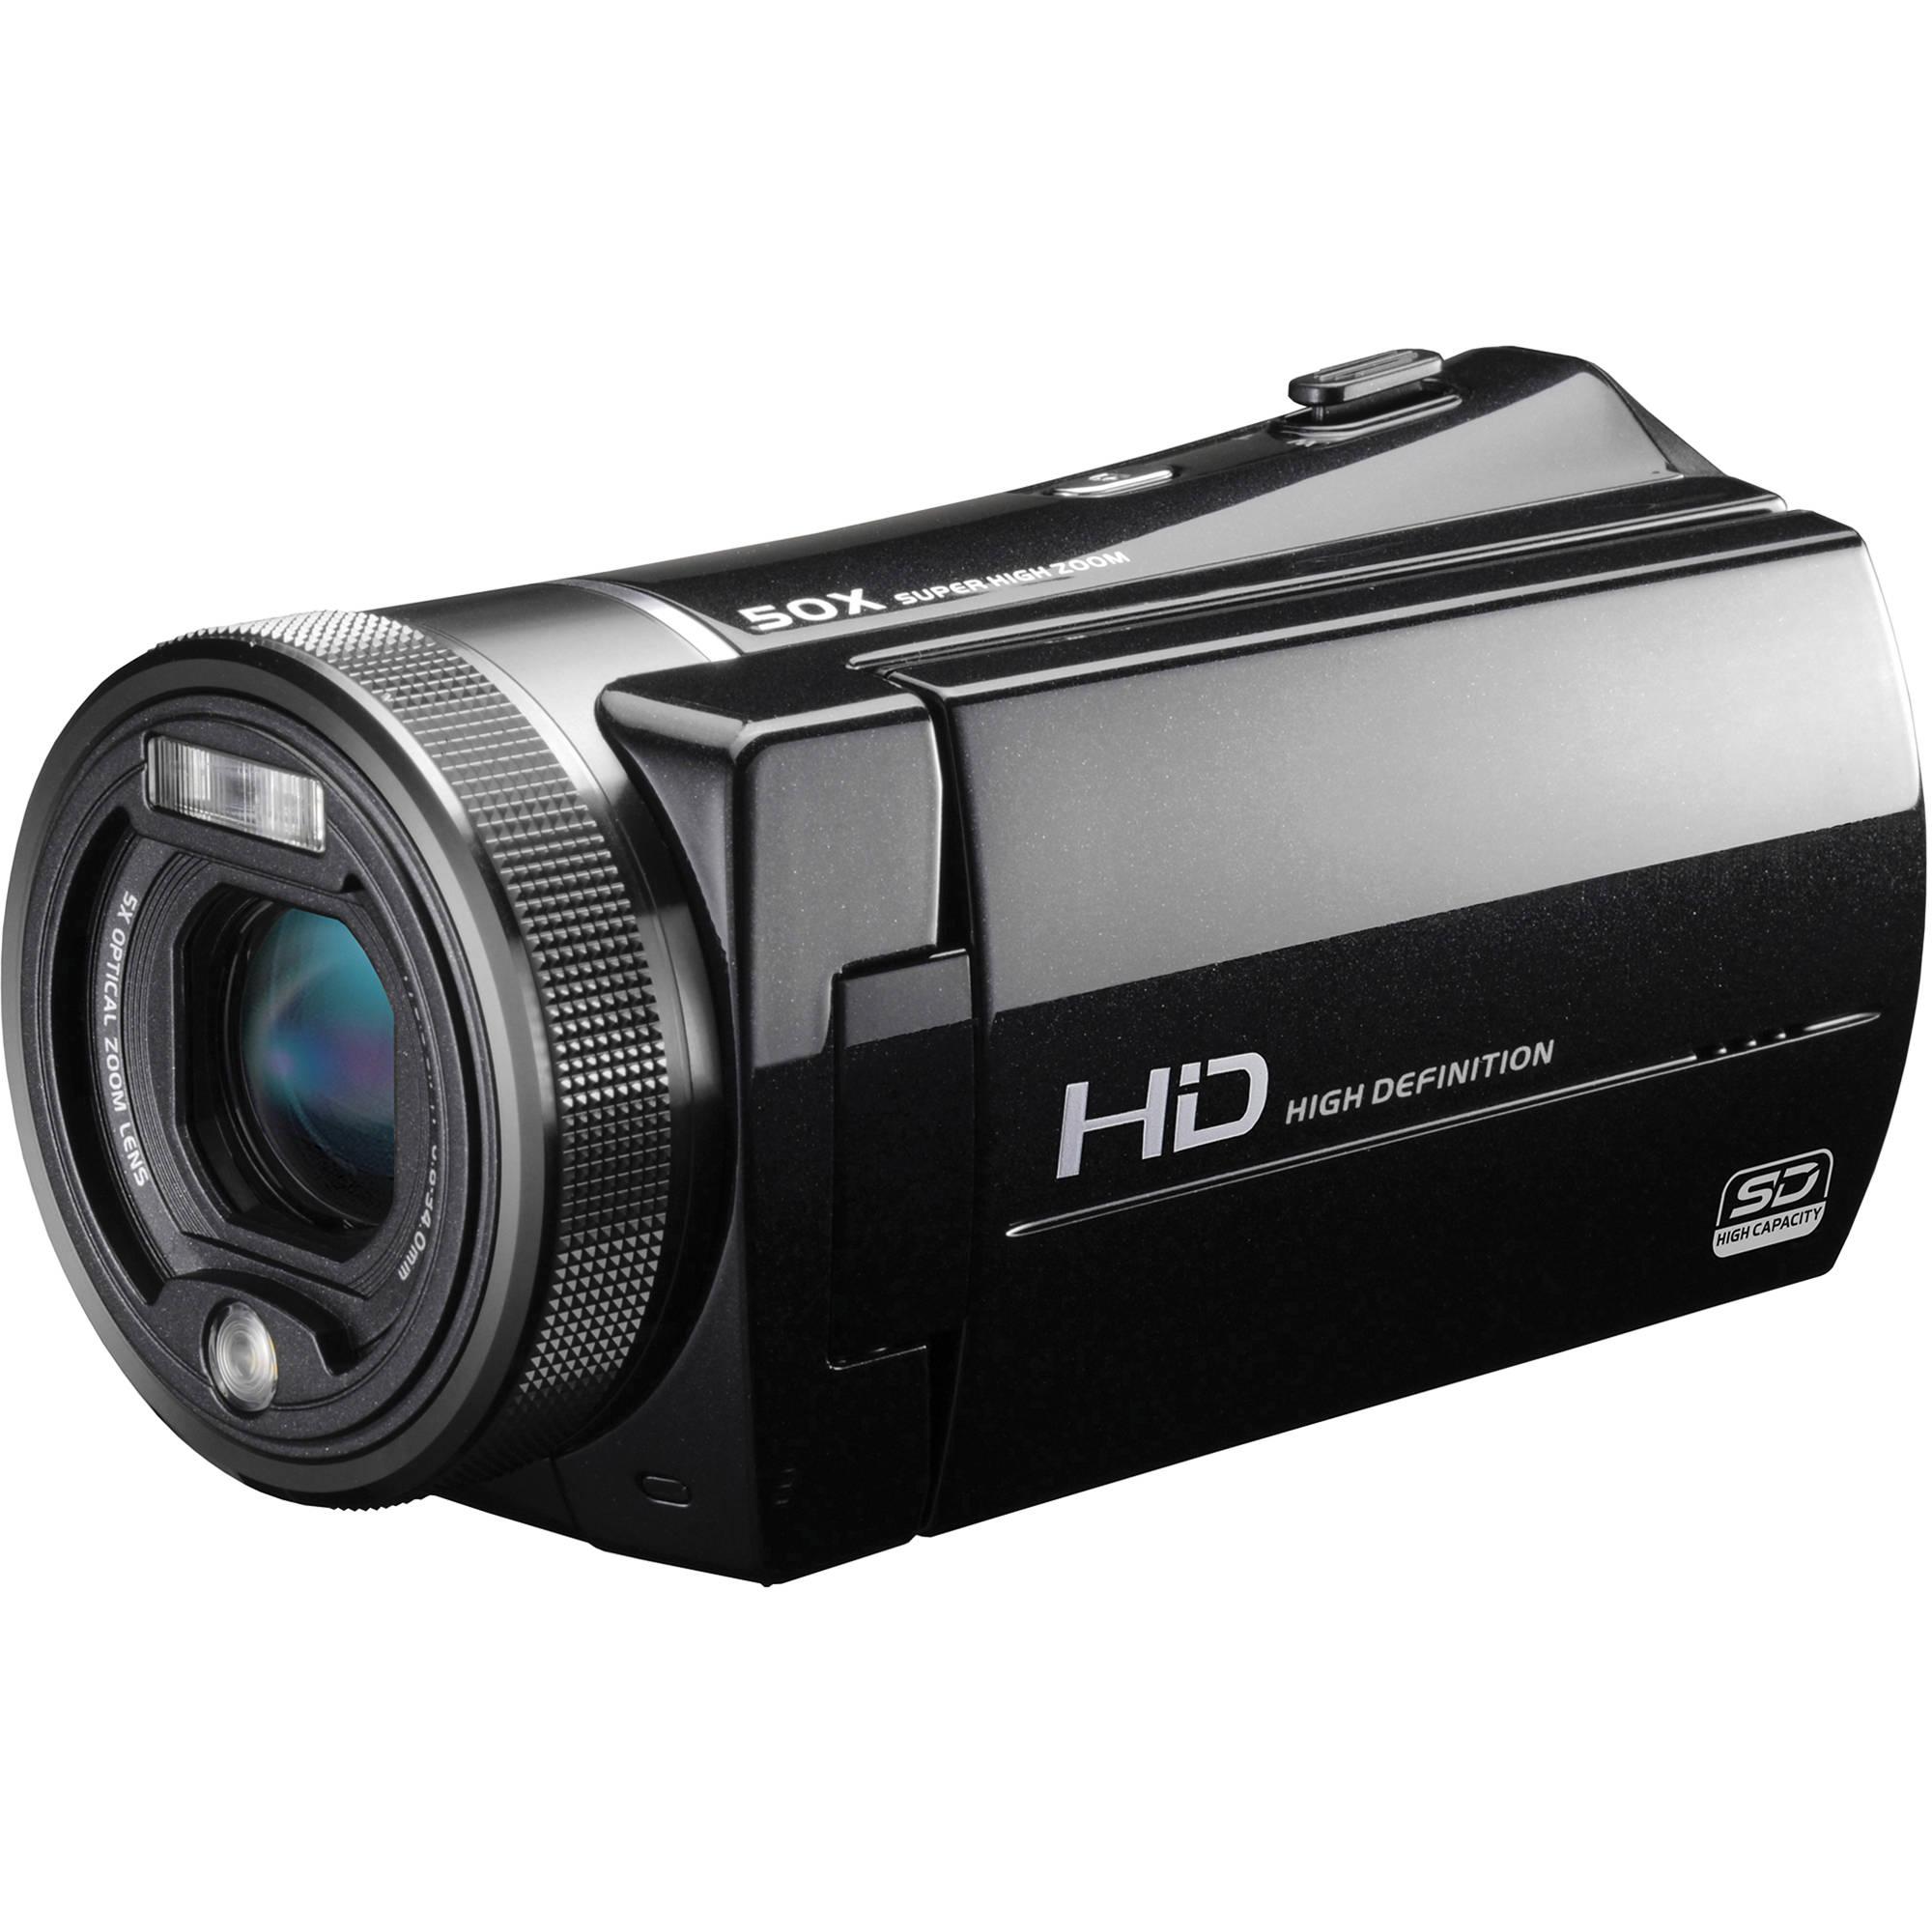 dxg dxg a80v hd camcorder dxg a80v b h photo video rh bhphotovideo com dxg 572v digital camcorder manual dxg 5.1 megapixel digital camcorder manual